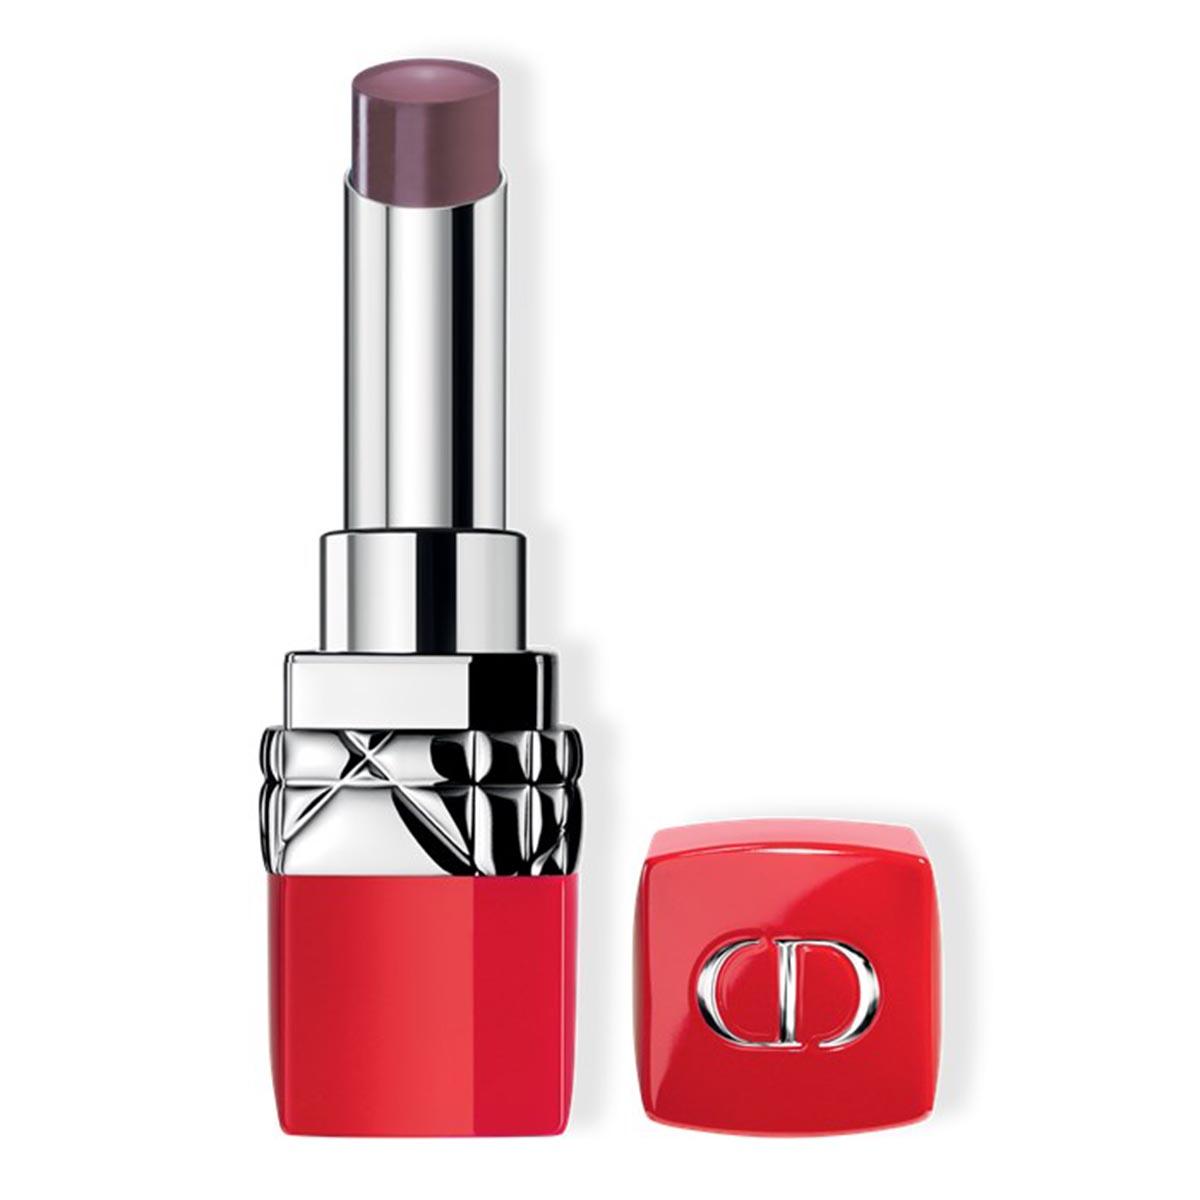 Dior rouge dior lipstick 485 ultra lust